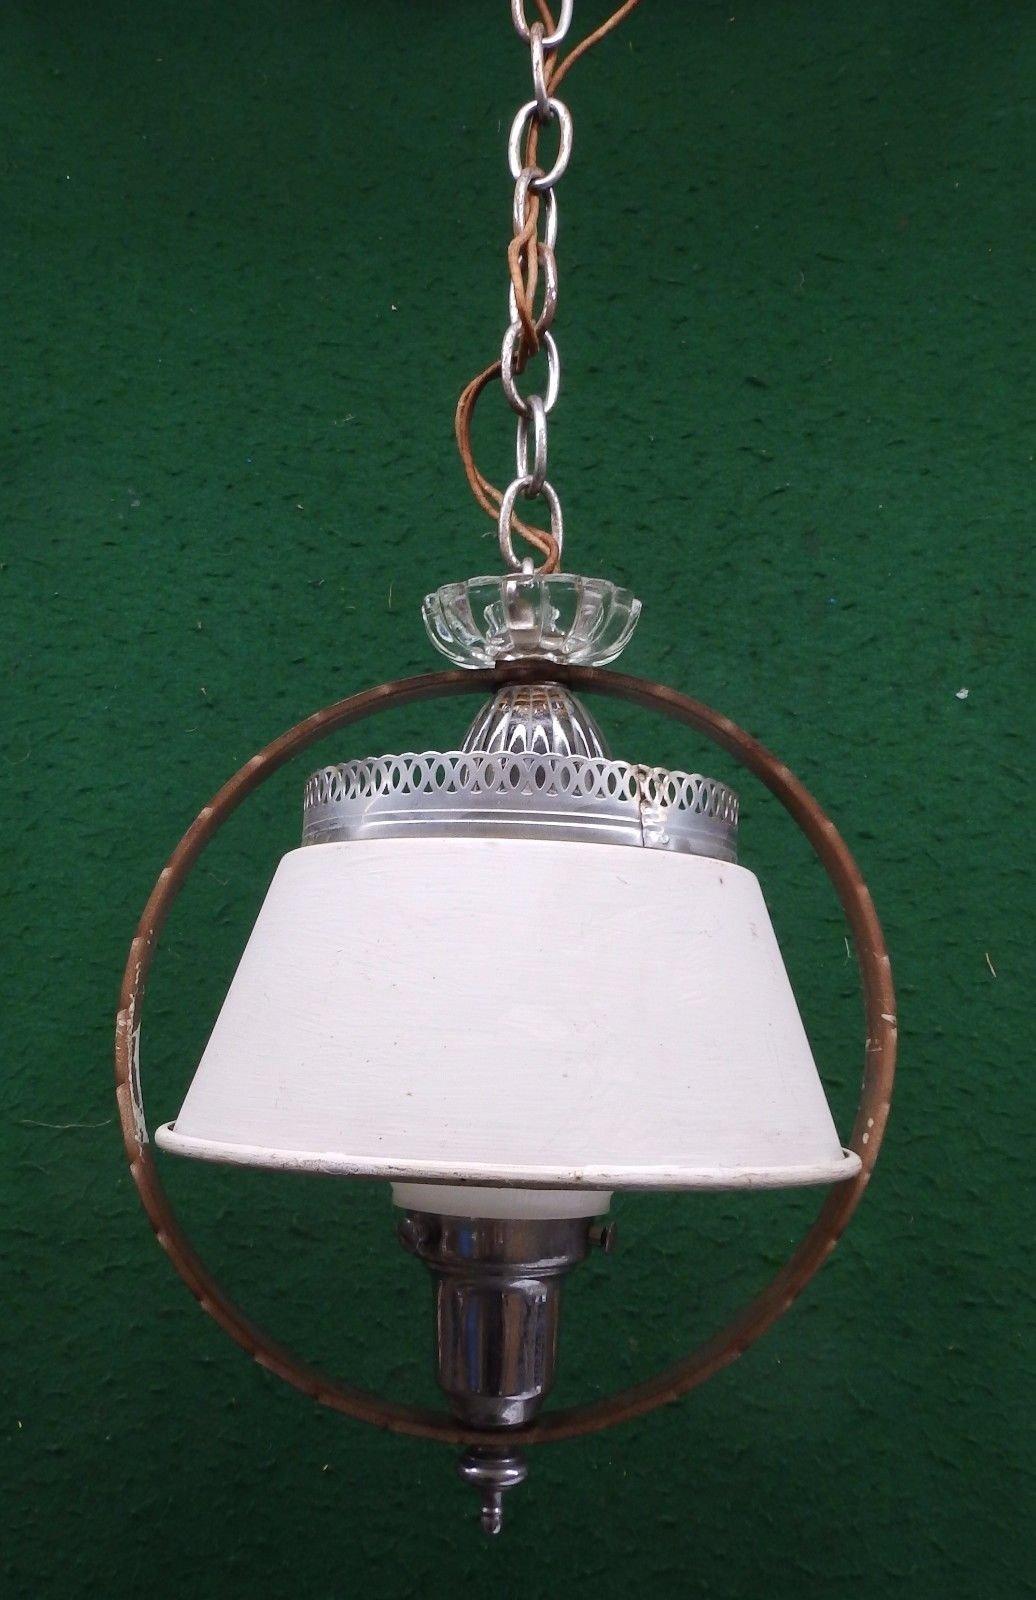 Vintage Art Deco Chrome Milk Glass Ceiling Light Fixture Shabby Old ...